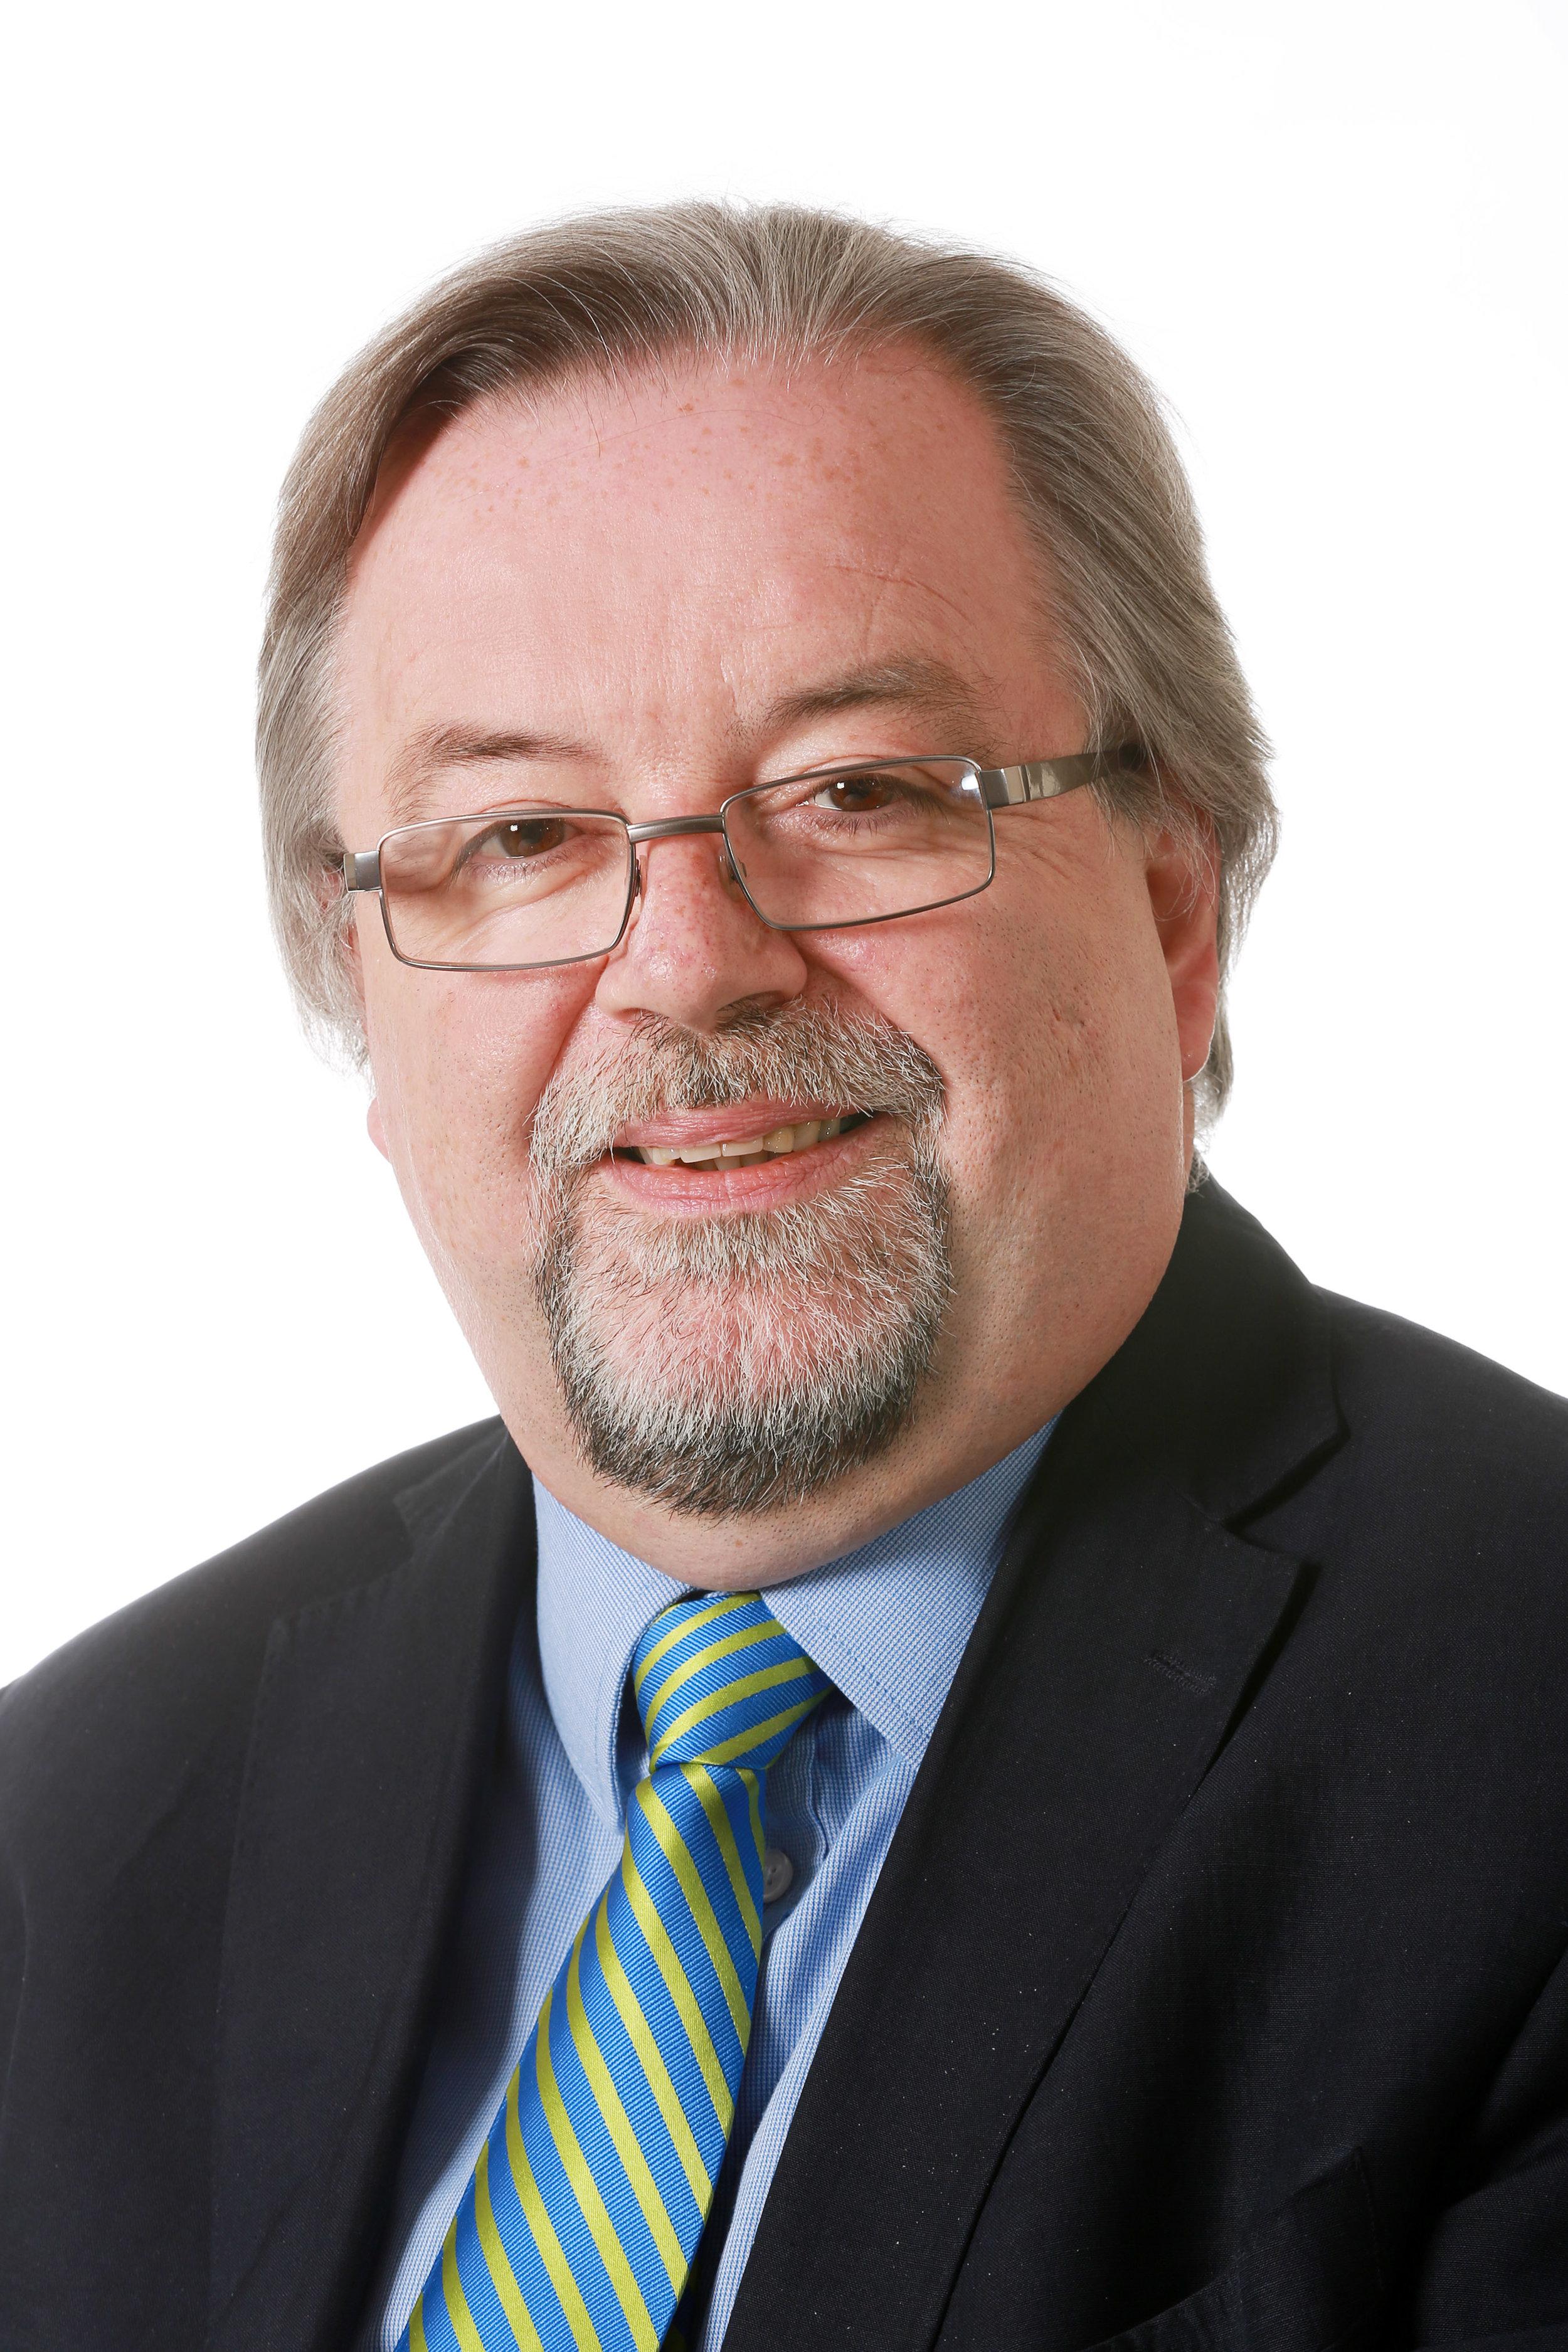 Seamus McAleavey, Chief Executive, NICVA